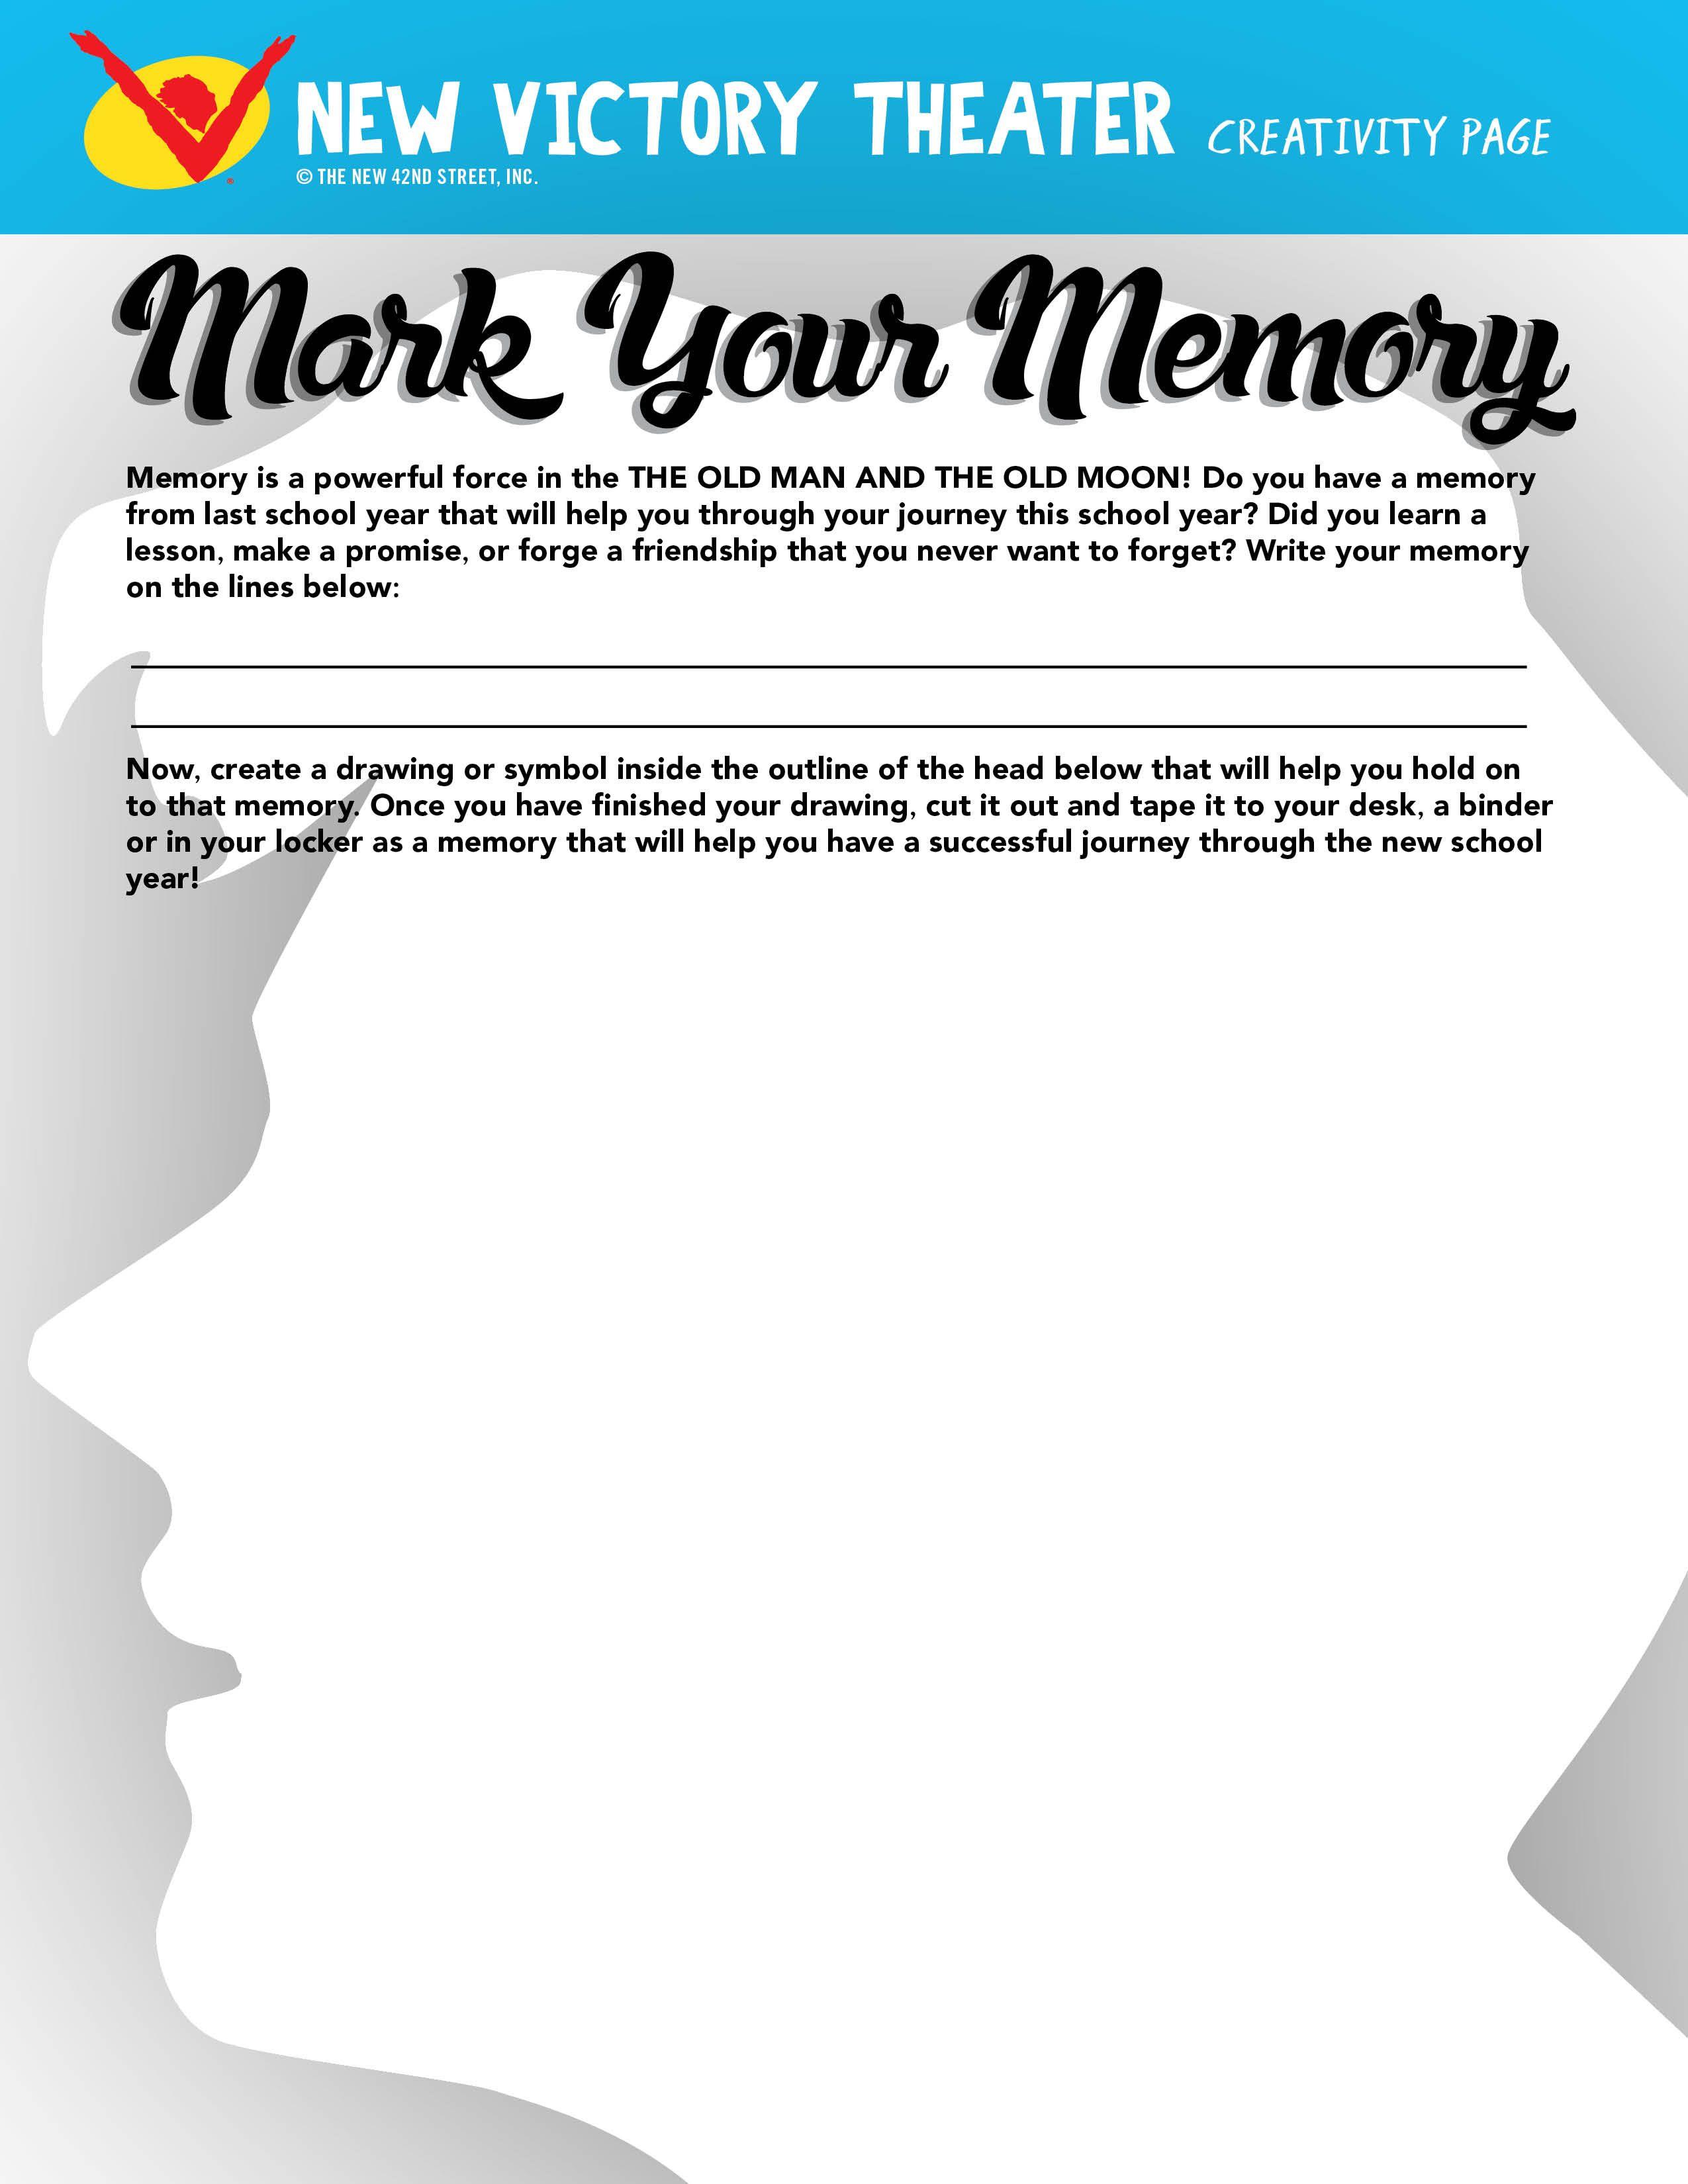 Mark Your Memory Storytelling Printable Worksheet